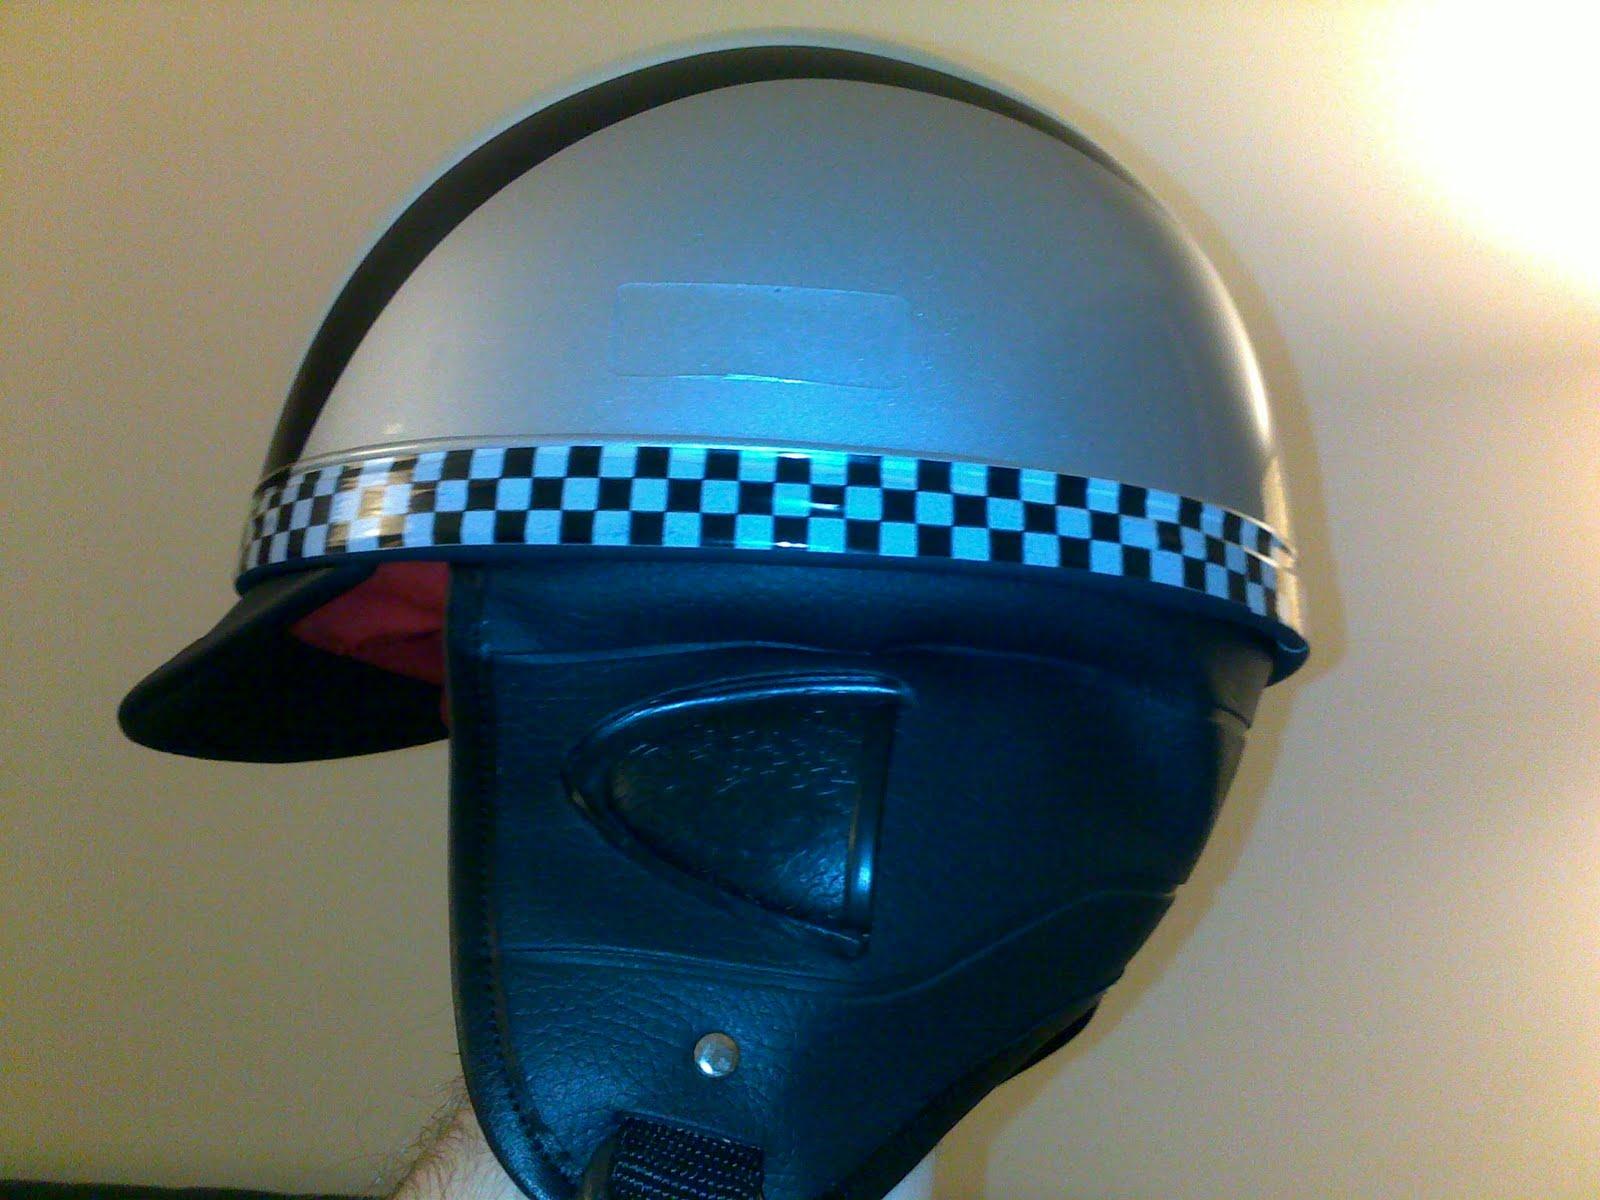 [Imagem: capacete+penico+ndn+cinza+azul.jpg]